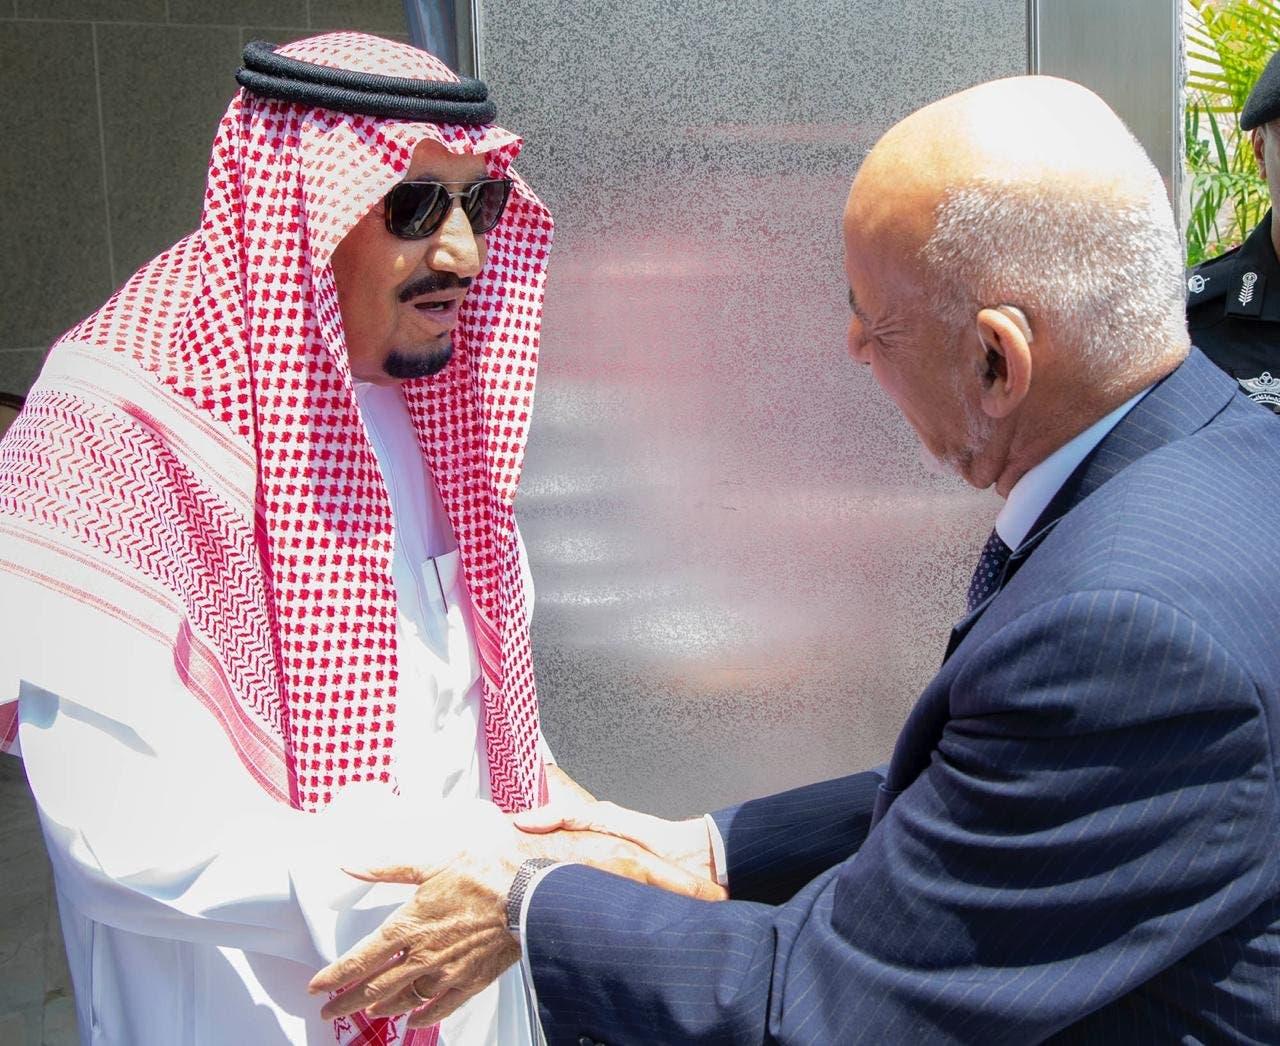 Saudi King Salman bin Abdulaziz received the President of Afghanistan Ashraf Ghani at the al-Salam Palace in Jeddah on Sunday - spa